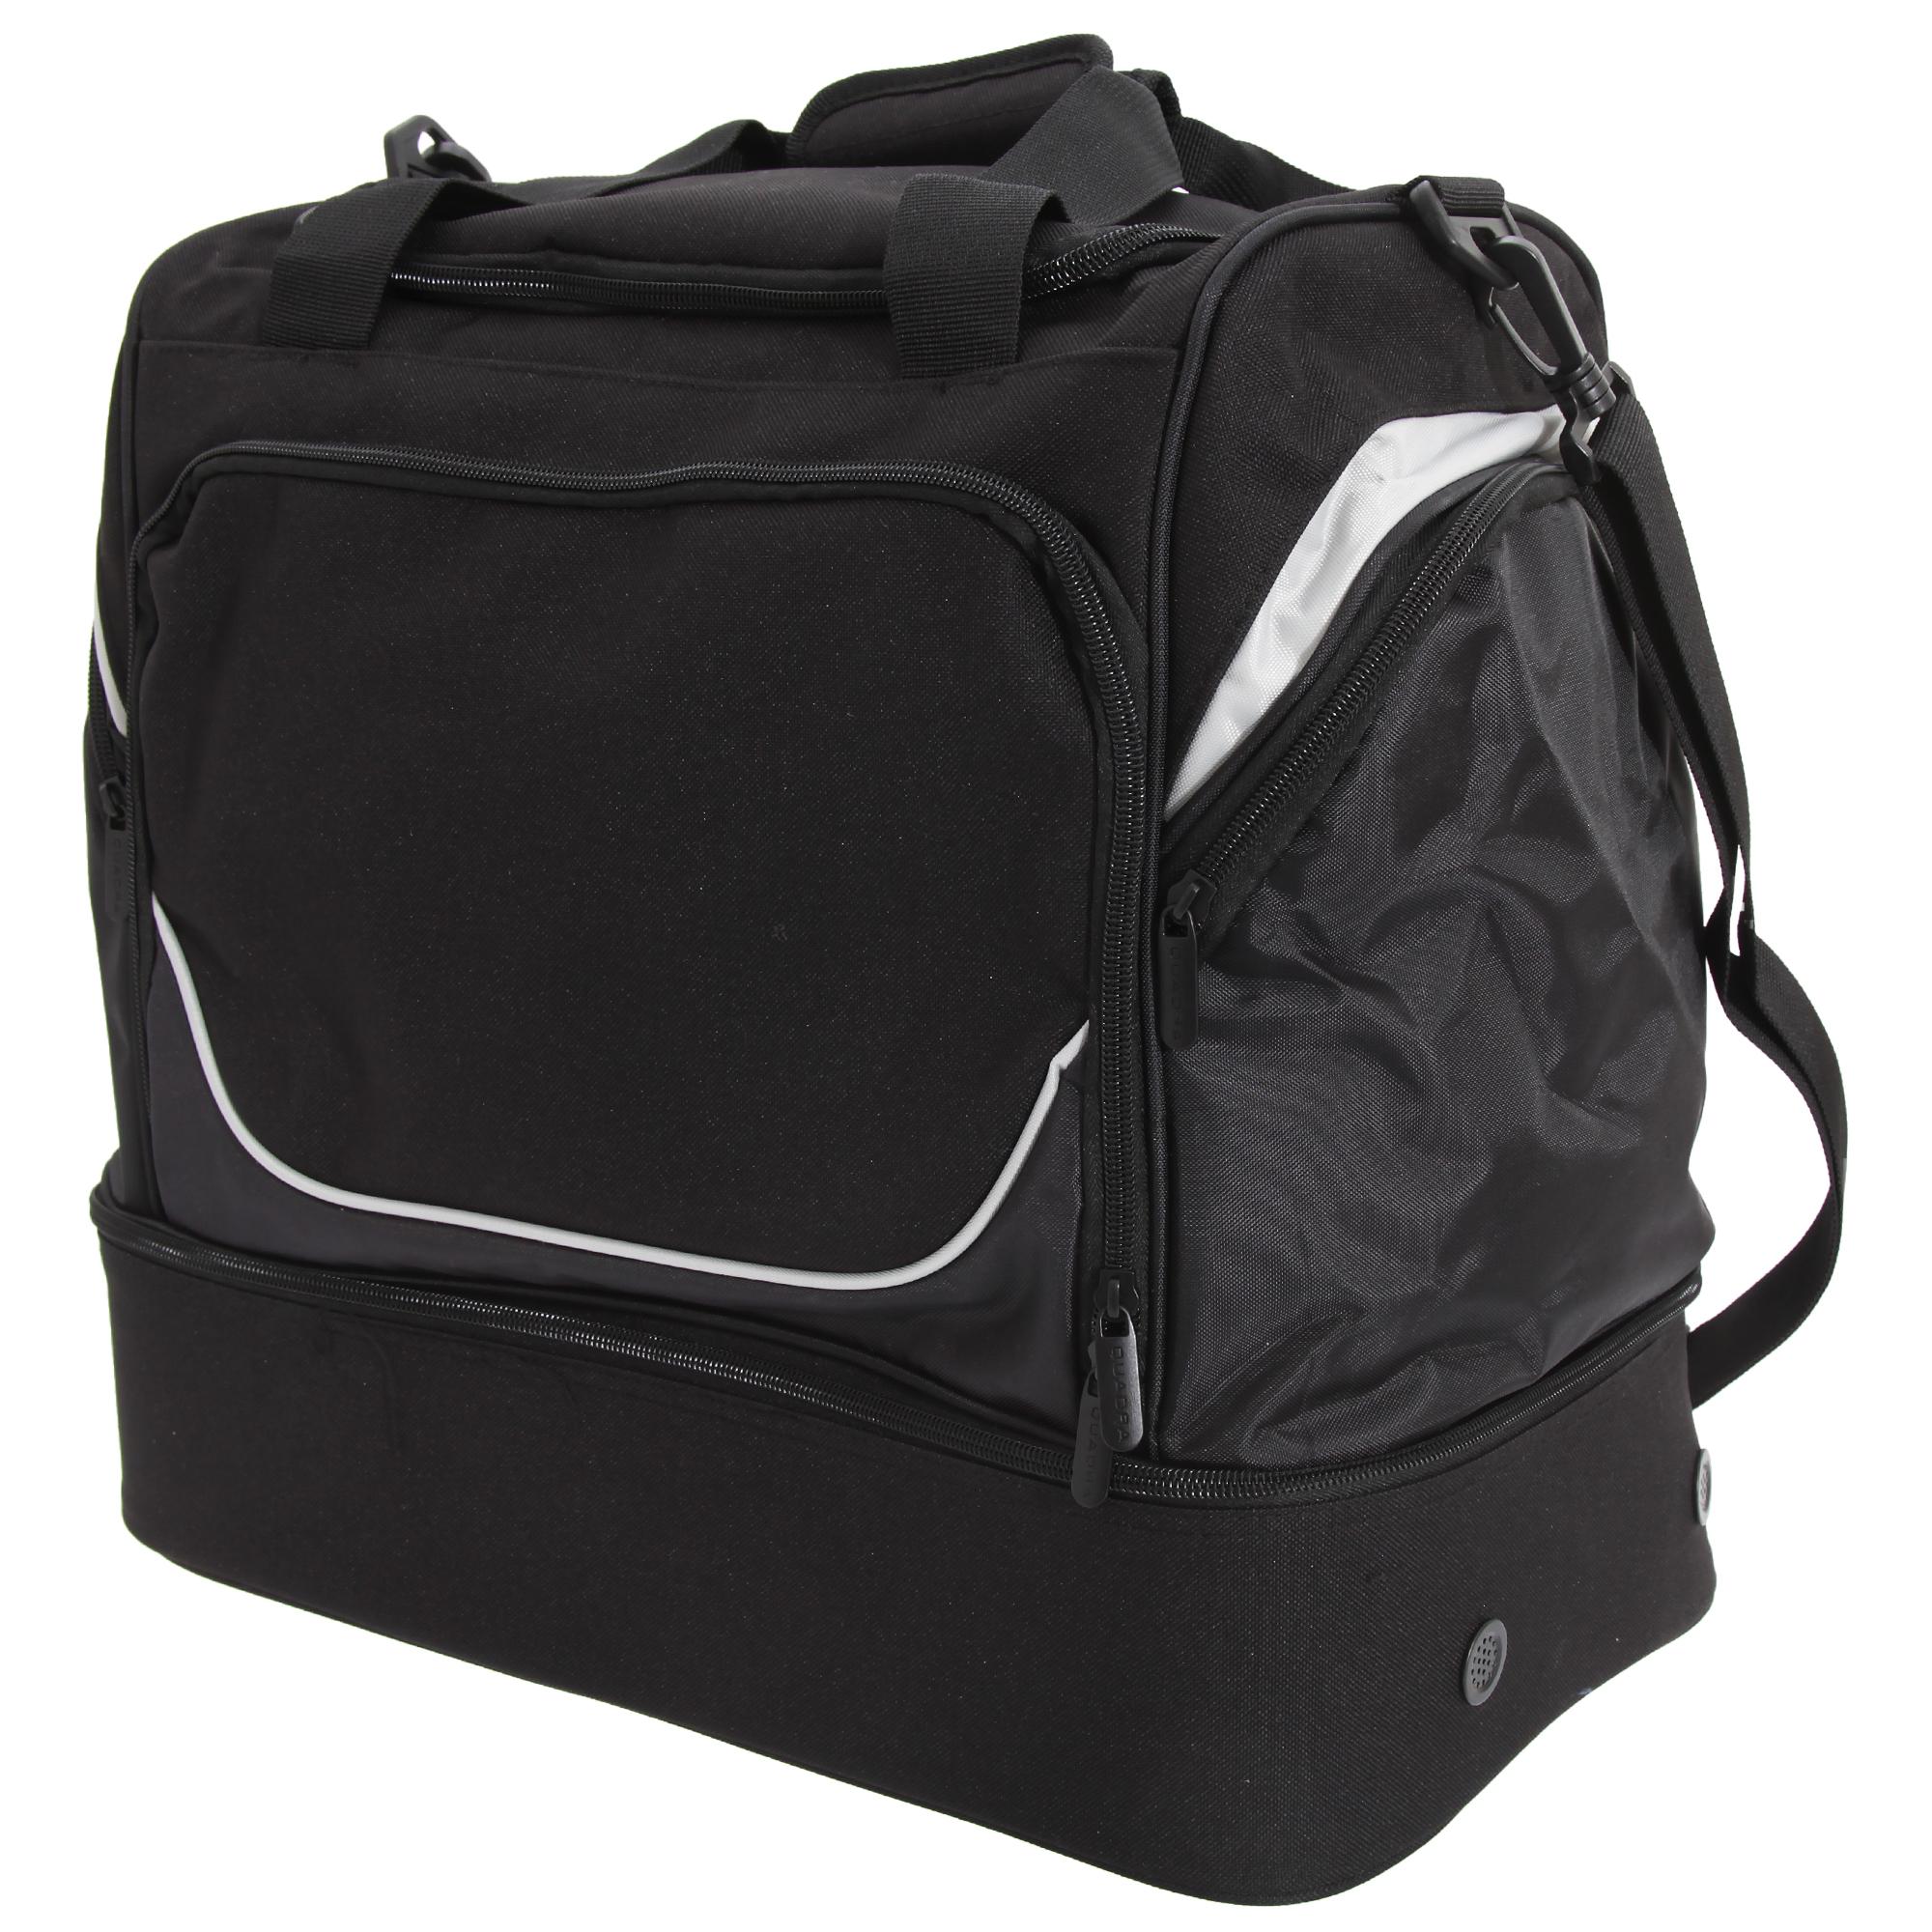 Quadra Pro Team Hardbase Holdall (40 Litres) (One Size) (Black/Light Grey)